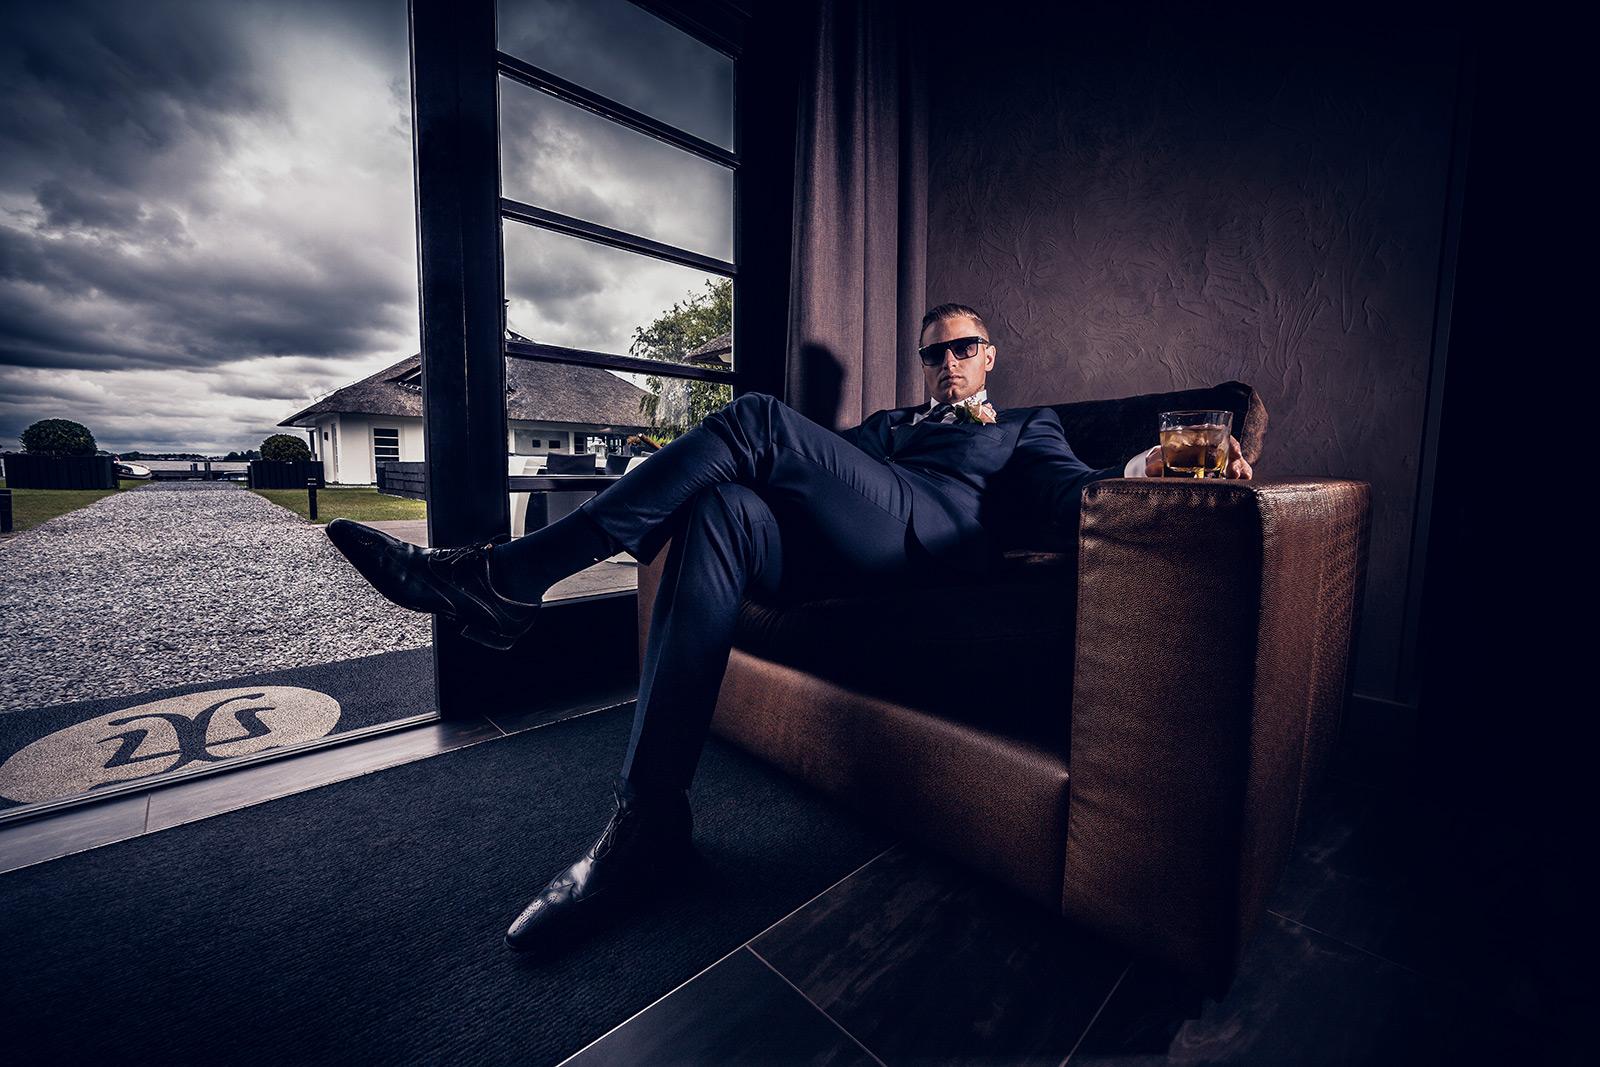 Bas-Driessen-Fotografie-Bruidsreportage-Erik-Olla-Finley-Loosdrecht-30